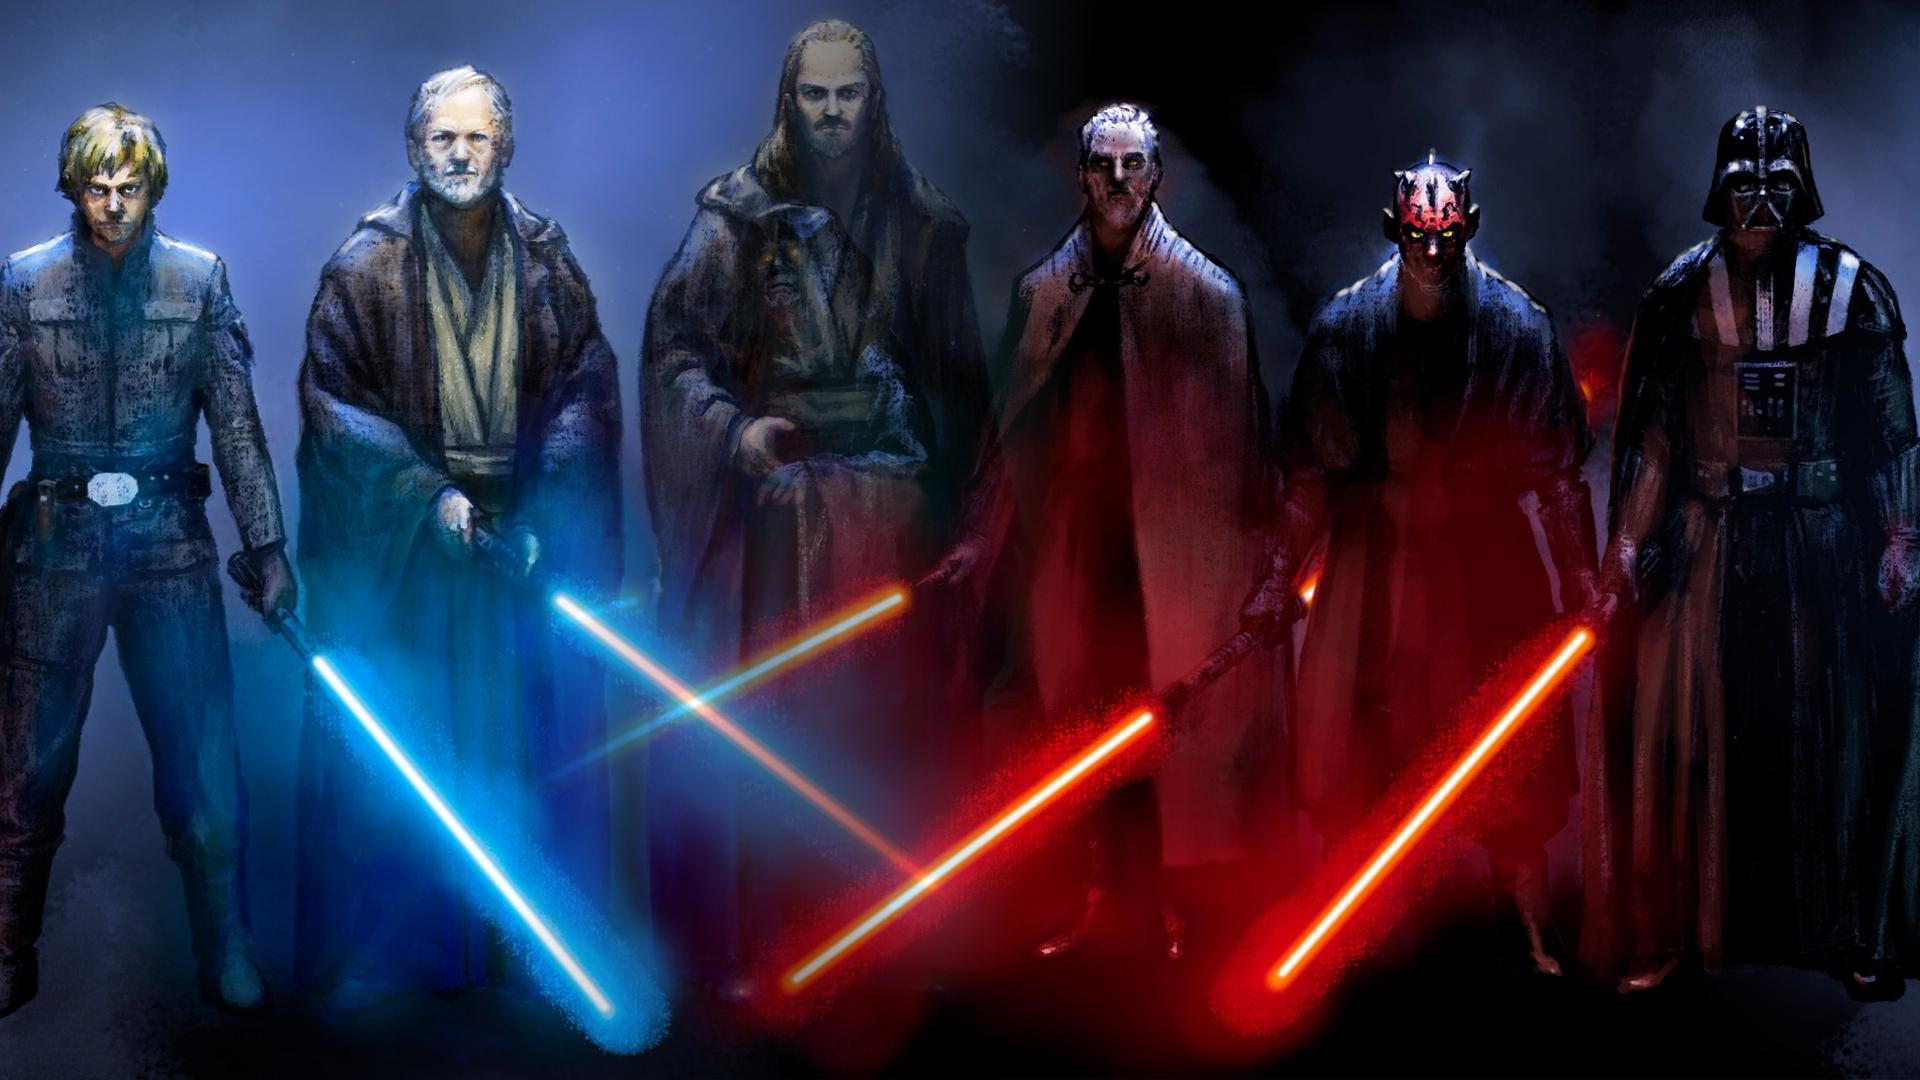 49 Sith Vs Jedi Wallpaper On Wallpapersafari